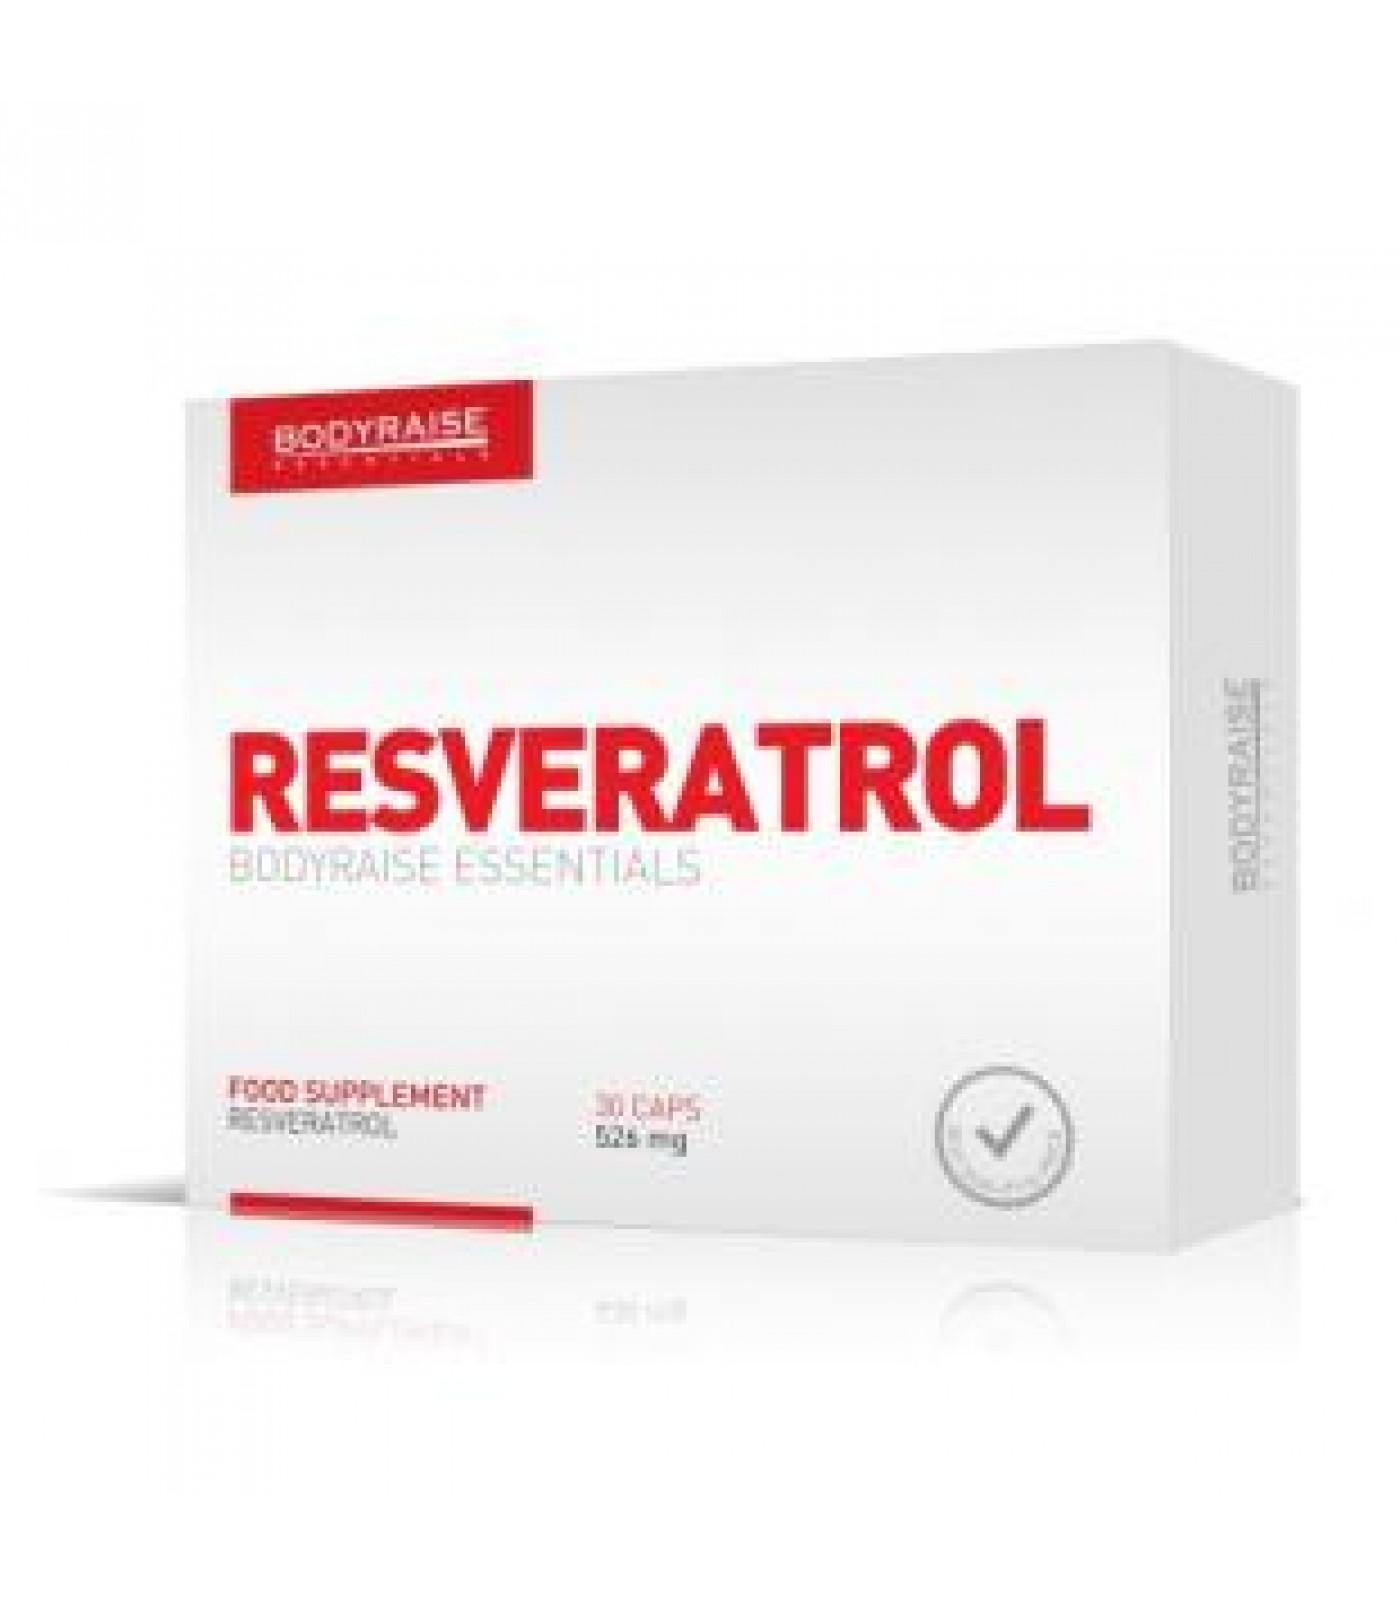 Bodyraise - Resveratrol 526mg / 30 caps.